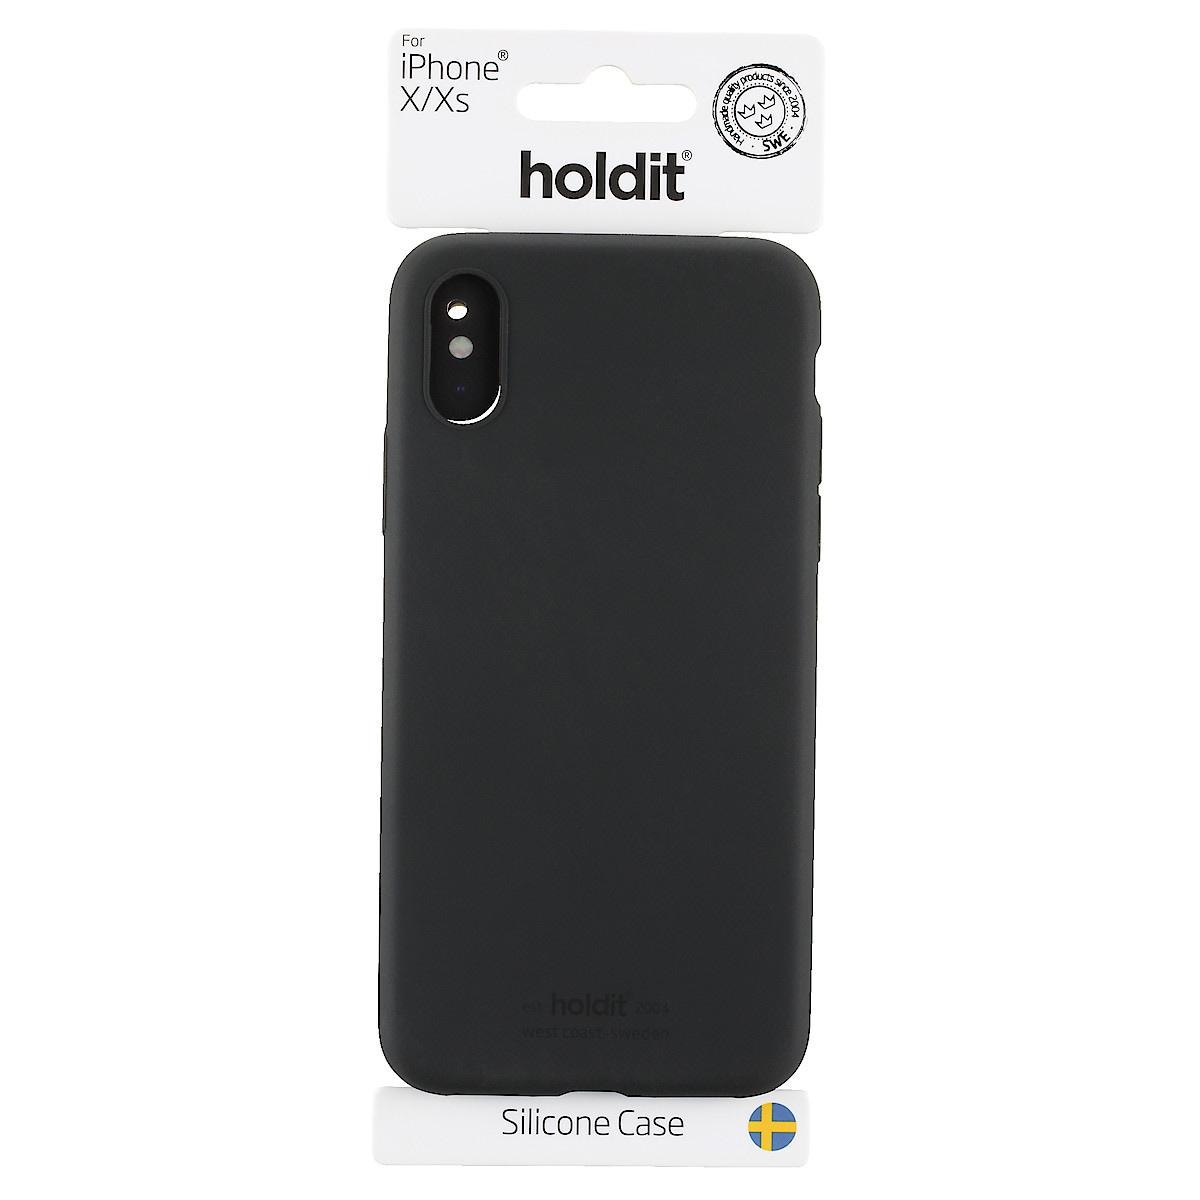 Mobilskal i silikon för iPhone X/XS, Holdit